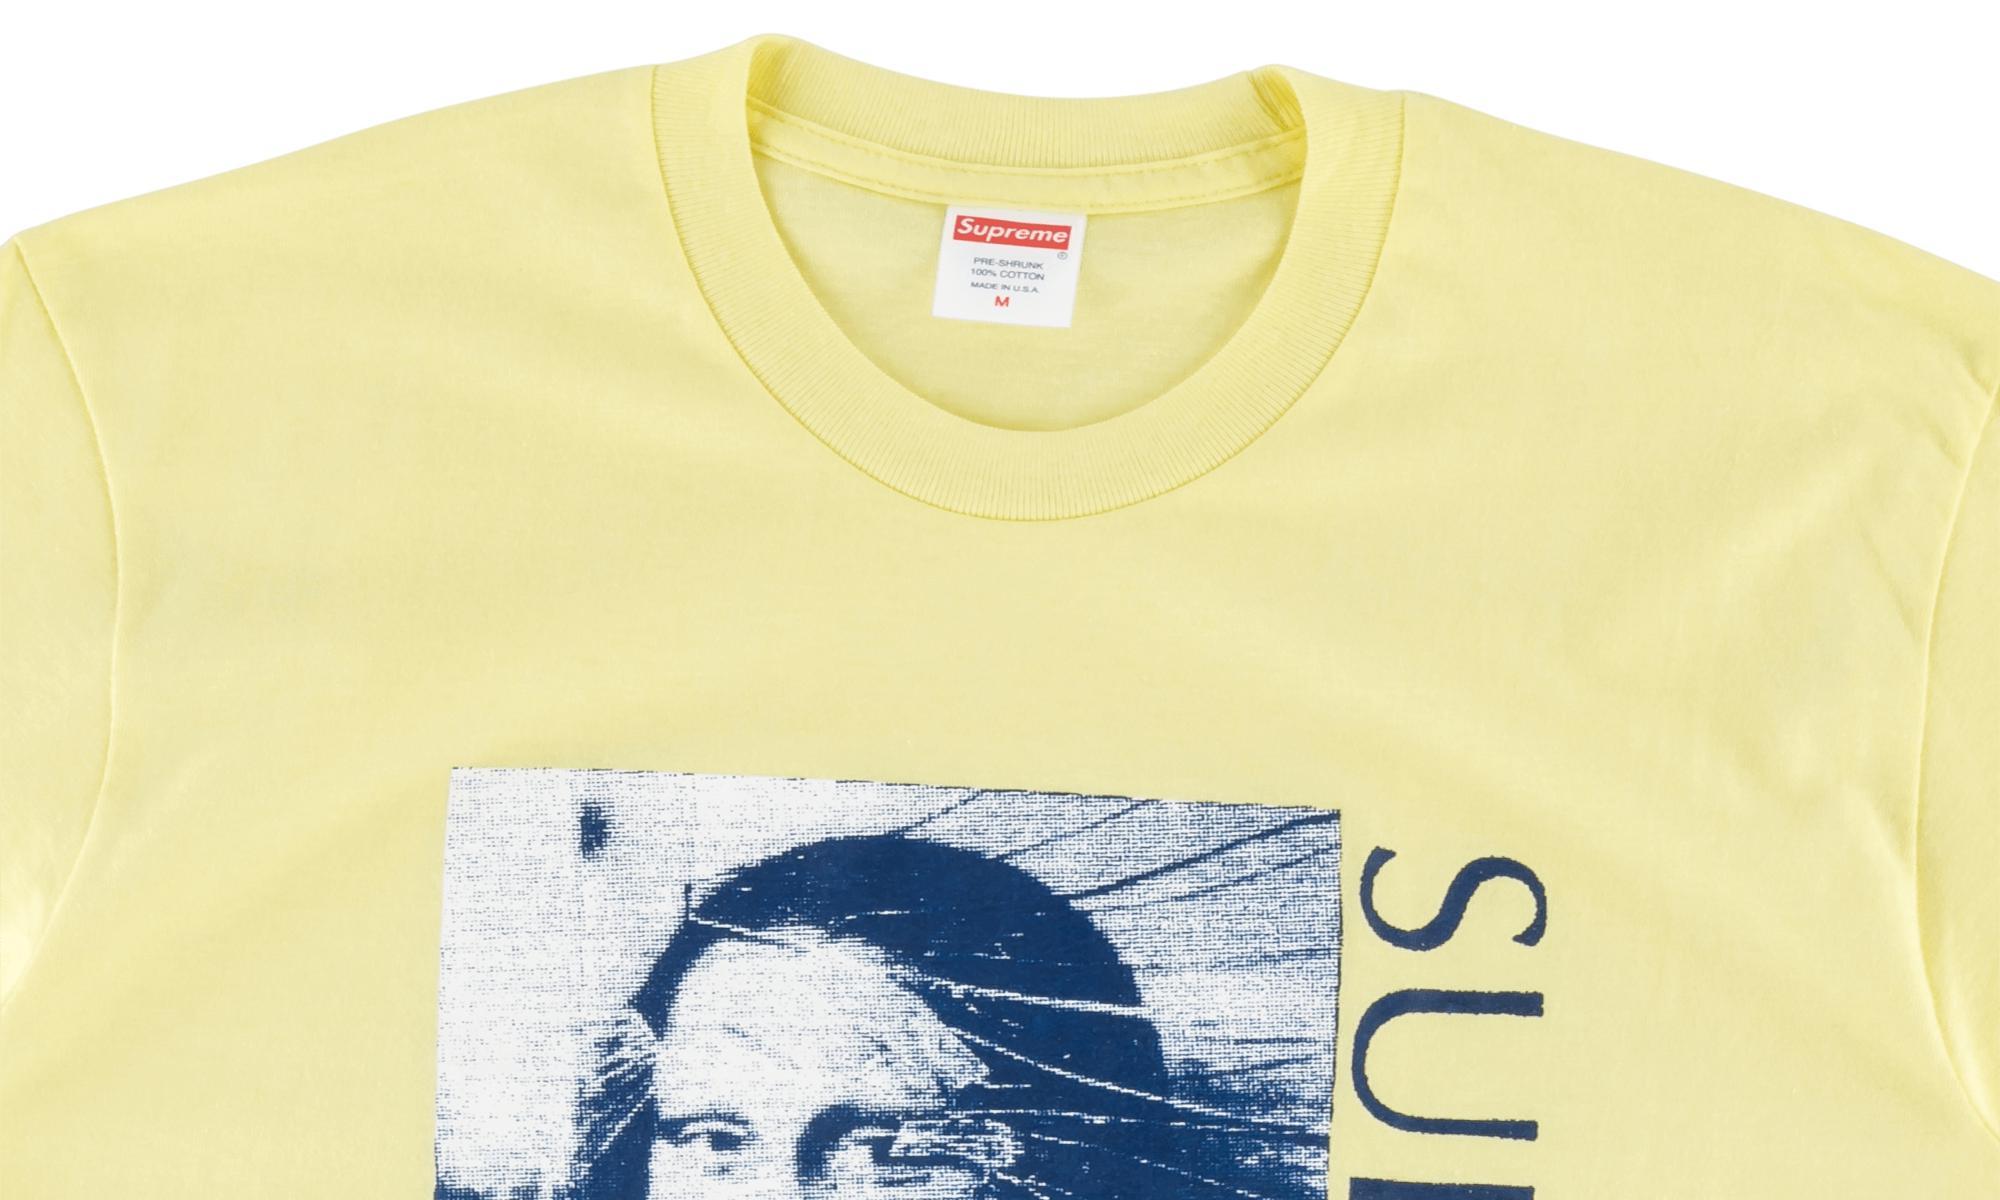 31bdb3d74938 Supreme - Yellow Mona Lisa Tee for Men - Lyst. View fullscreen